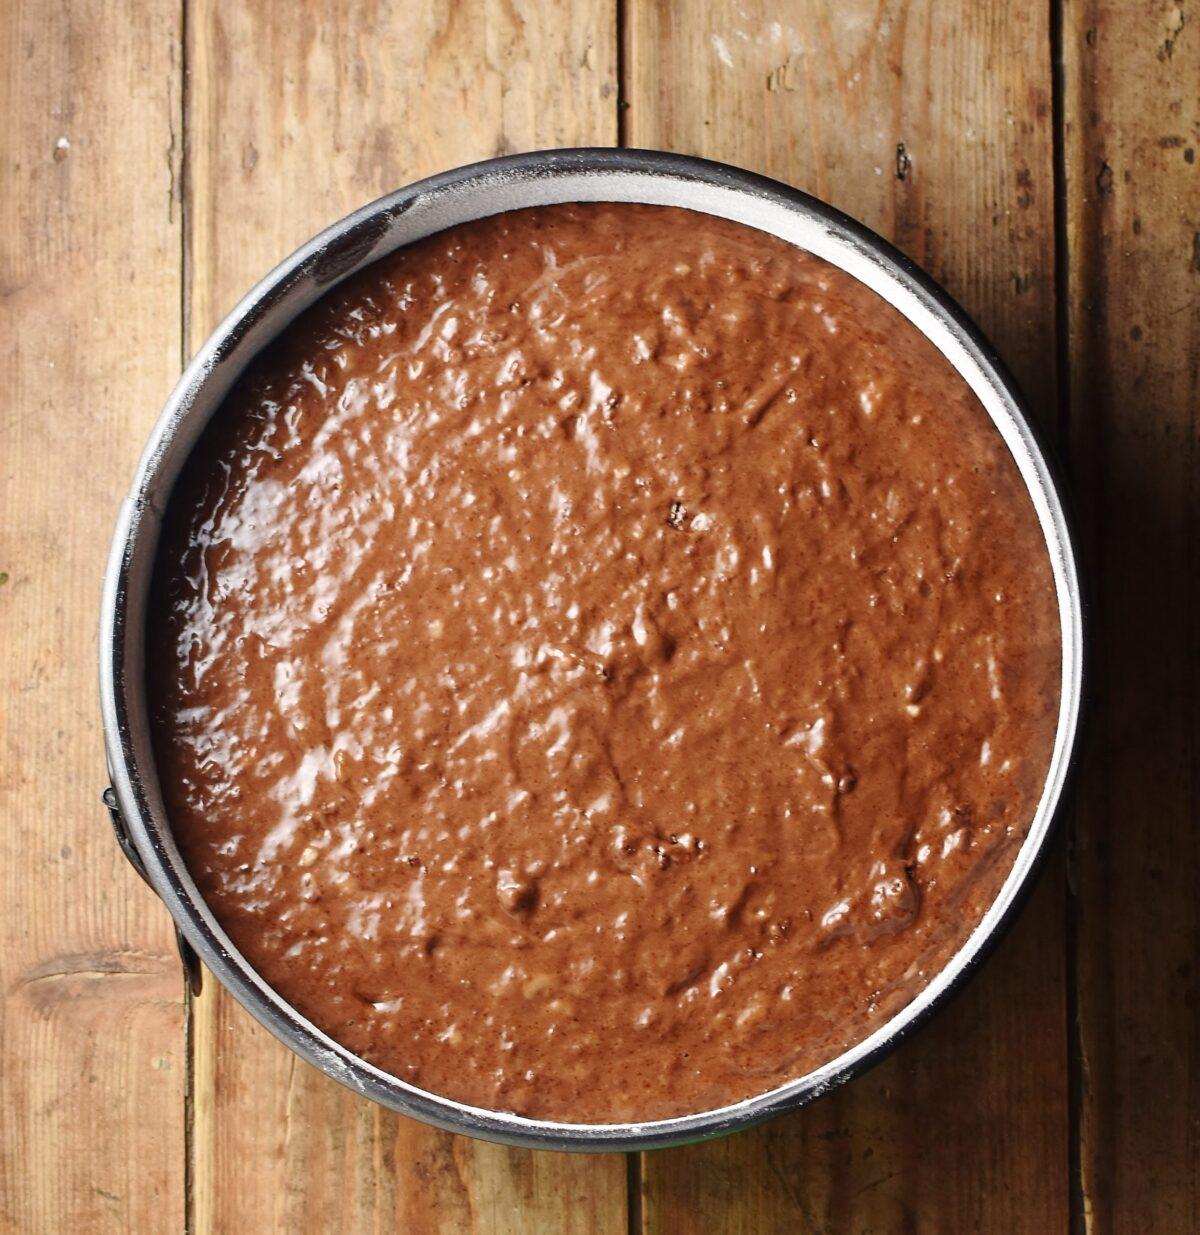 Unbaked chocolate banana cake in round pan.